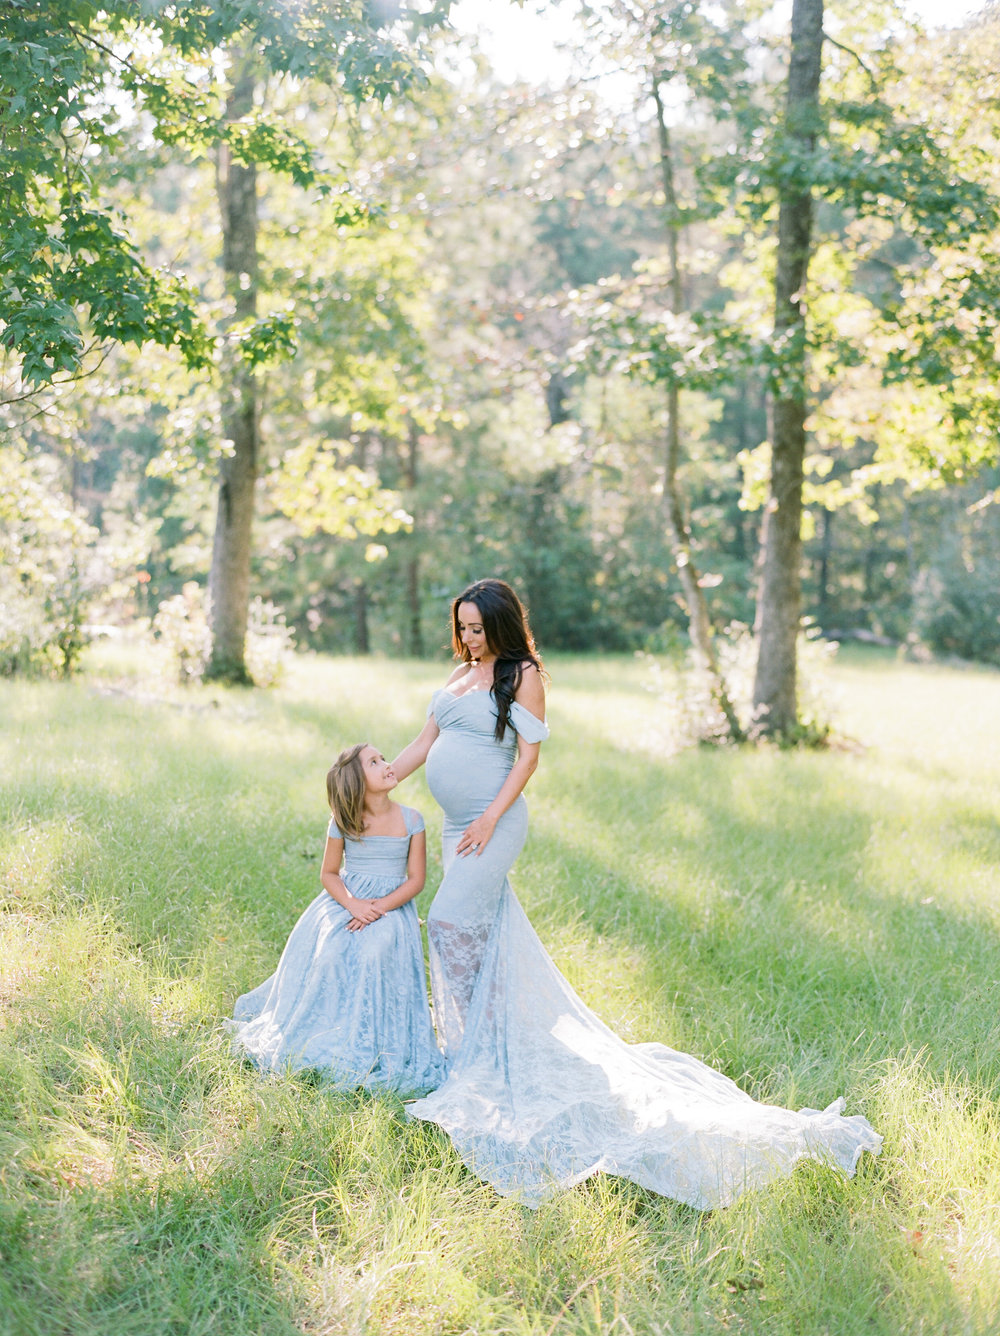 Fine-Art-Film-Houston-Wedding-Photographer-Best-Top-Luxury-Texas-Austin-Dallas-Destination-Dana-Fernandez-Photography-Portrait-Mommy-and-Me-Session-6.jpg